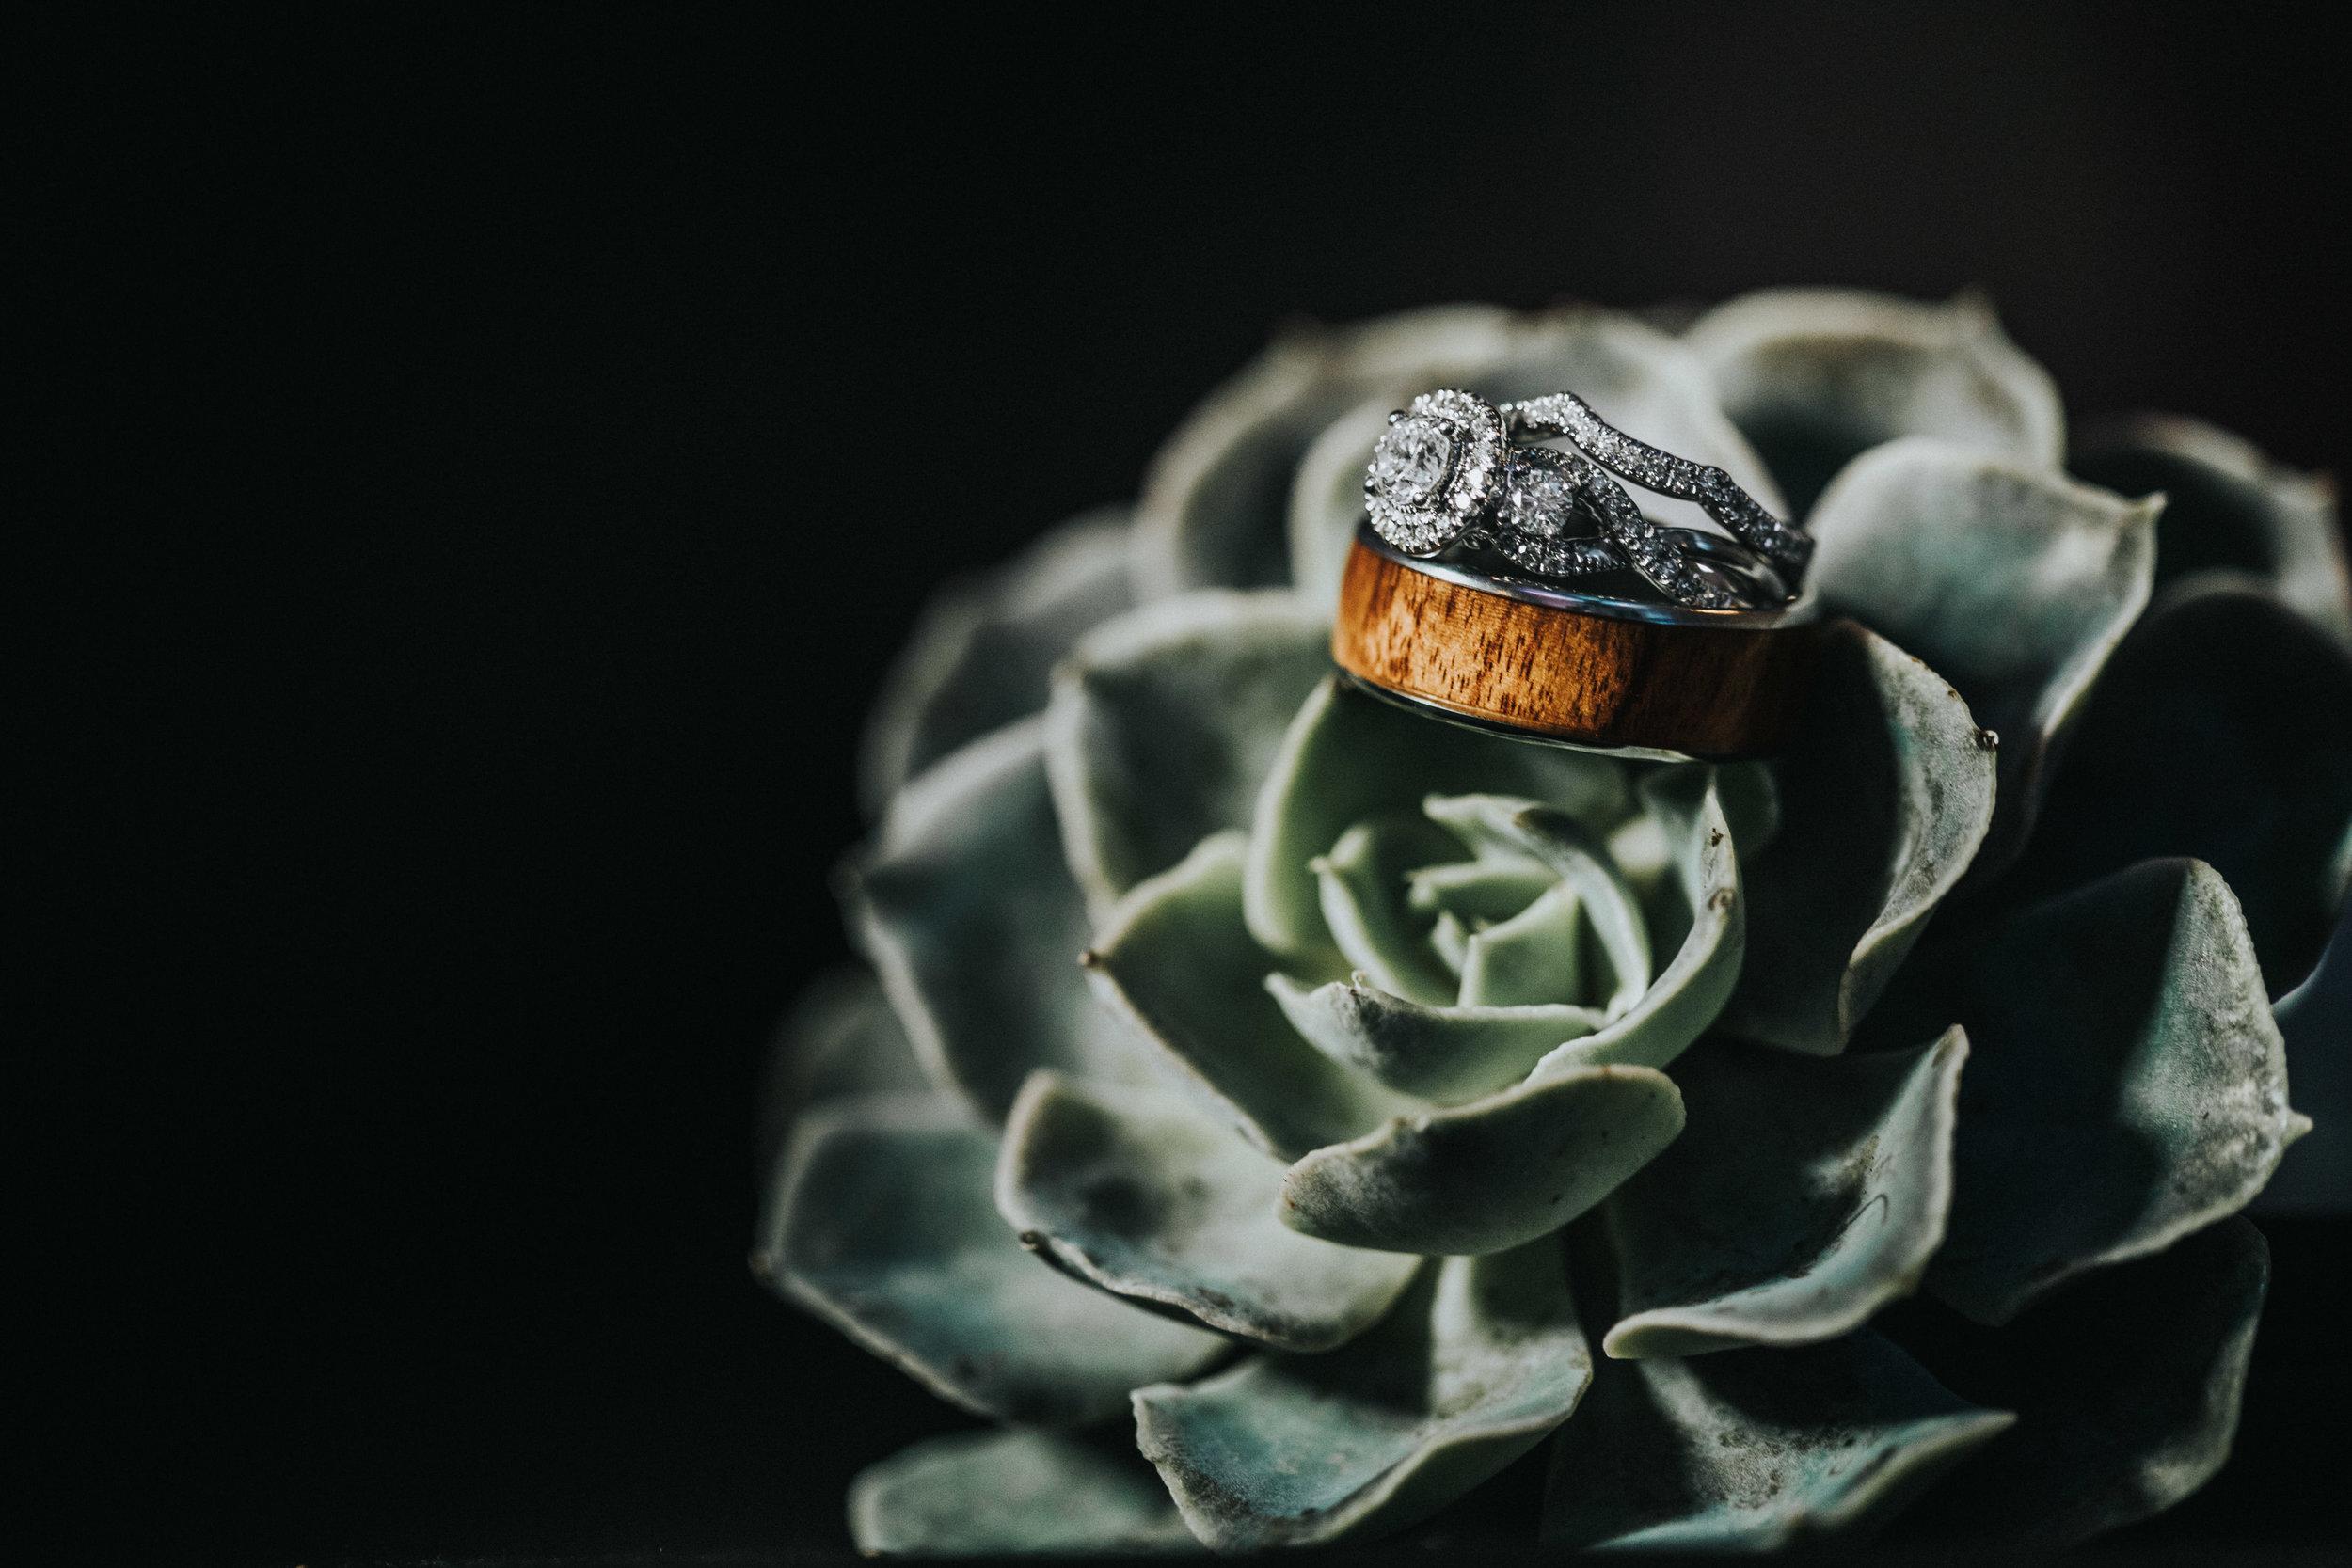 New-Jersey-Wedding-Photographer-ReceptionCenter-Valeria&Mike-Venue_Details (21 of 21).jpg